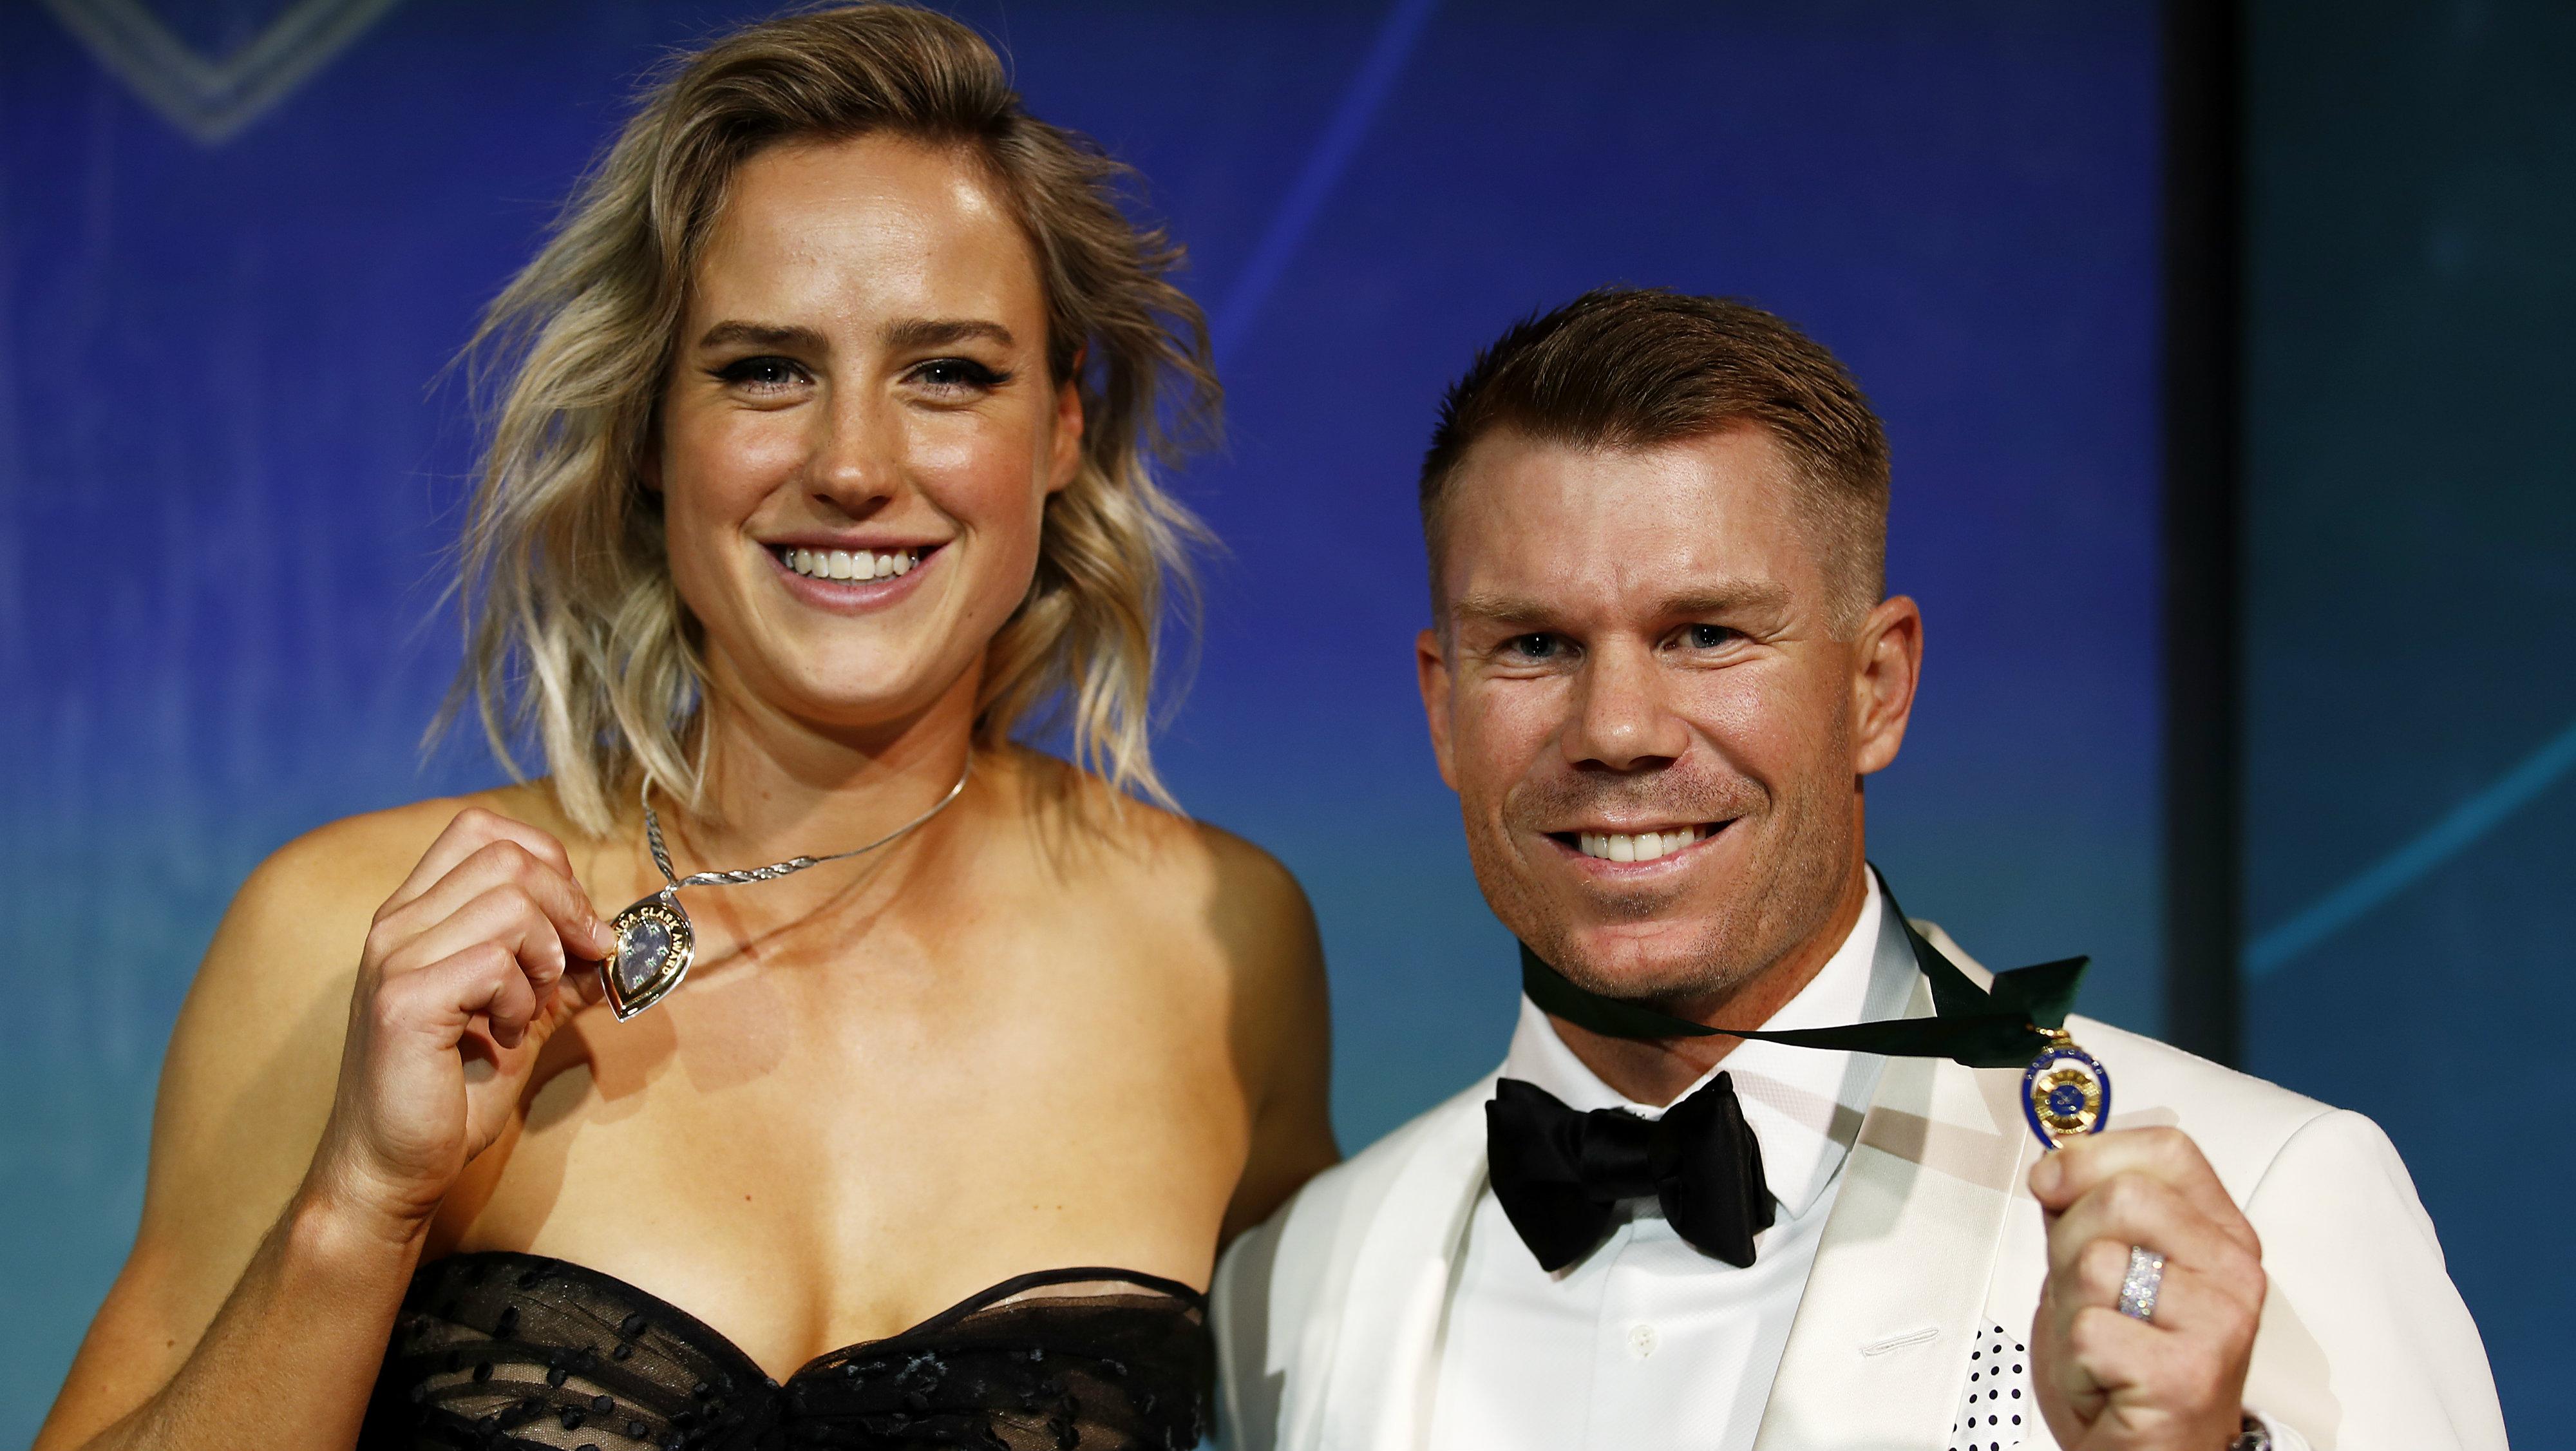 Australian Cricket Awards: David Warner and Ellyse Perry claim major honours